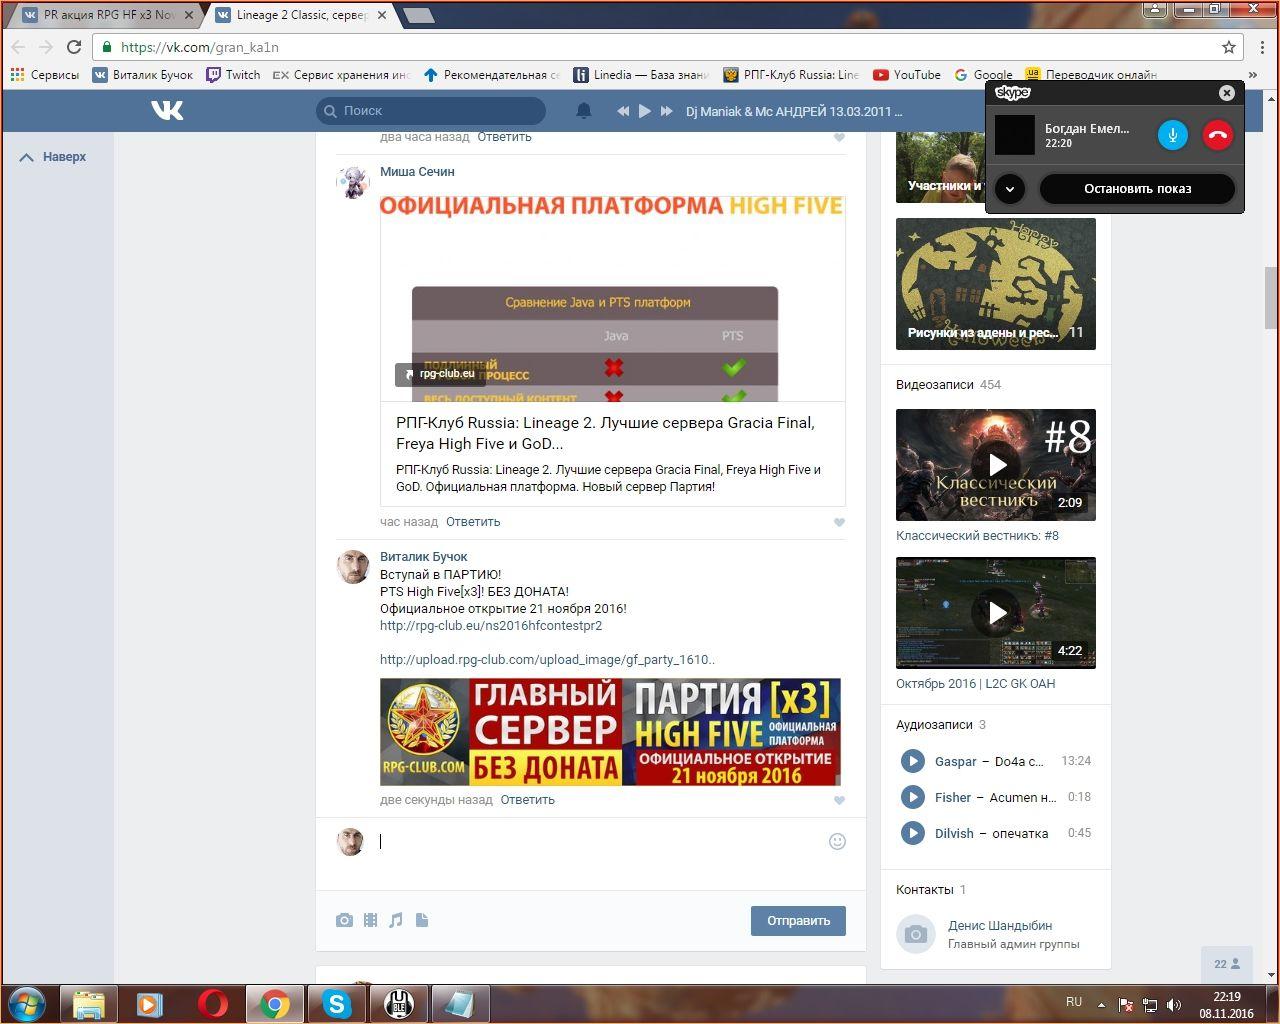 Lineage 2 Screenshot: Кланы д2